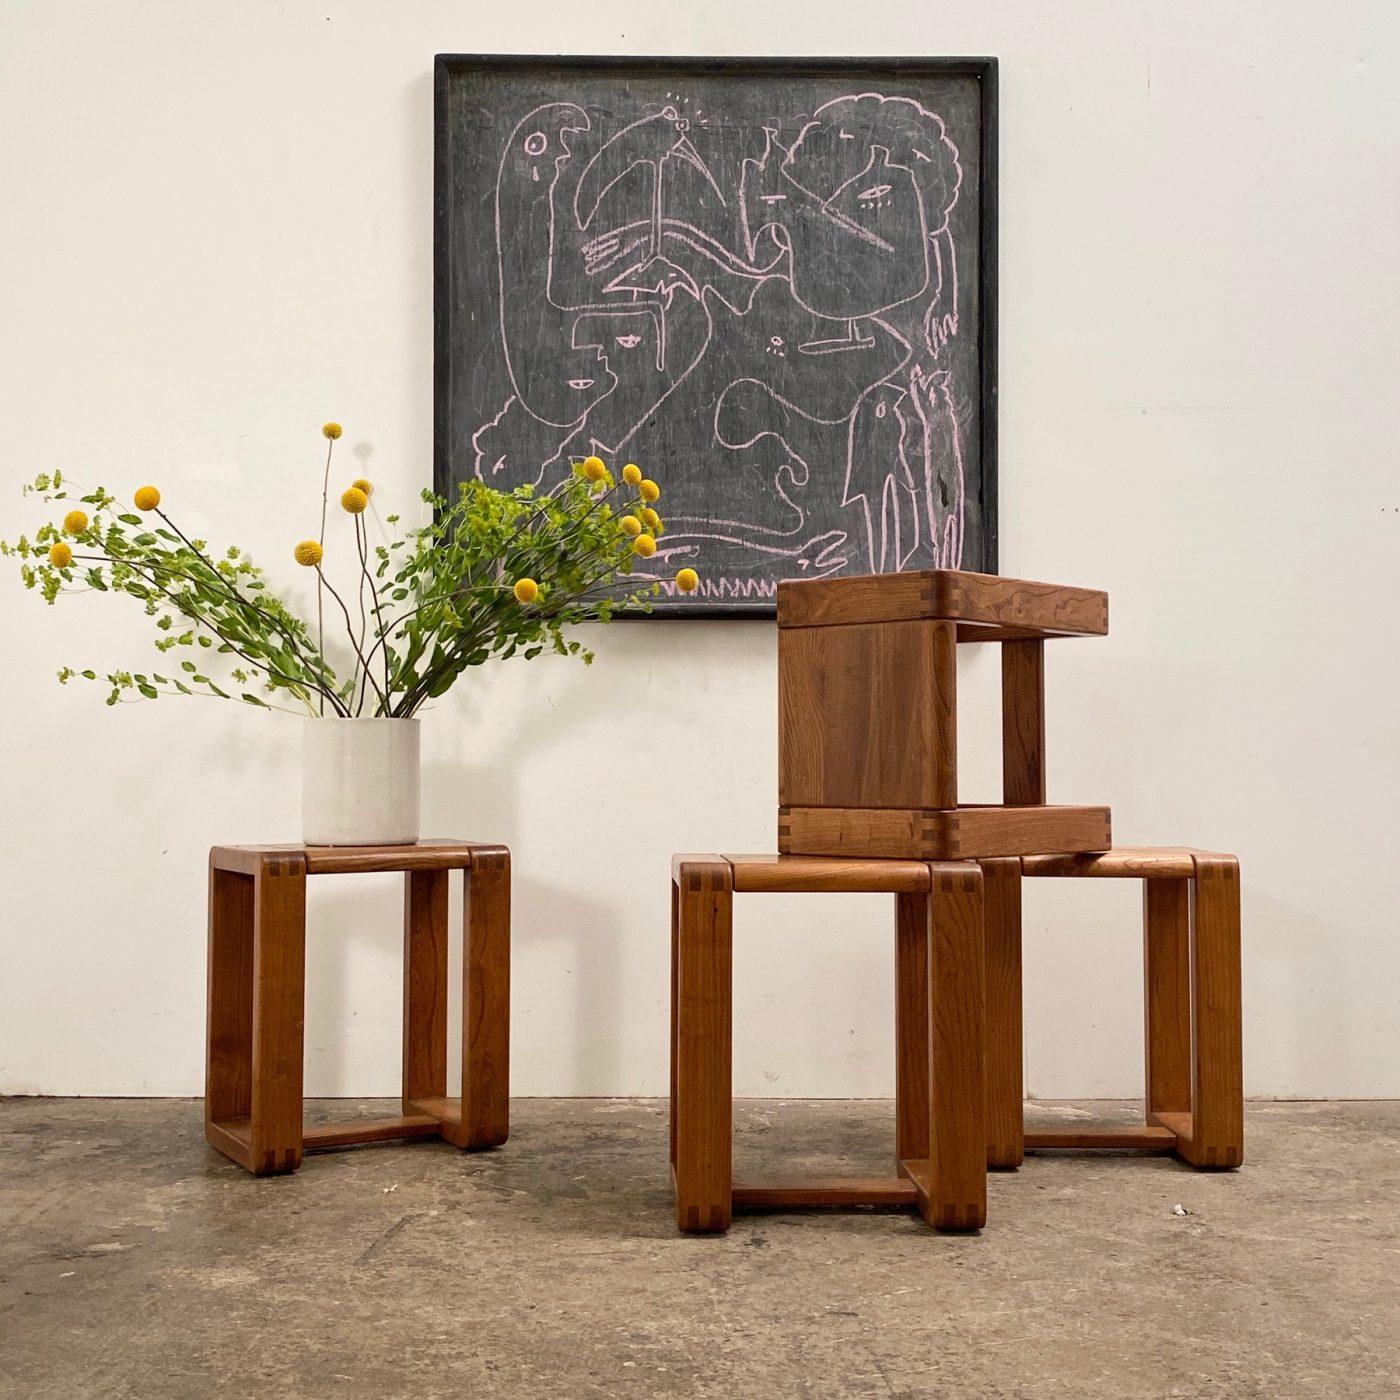 objet-vagabond-massive-stools0009